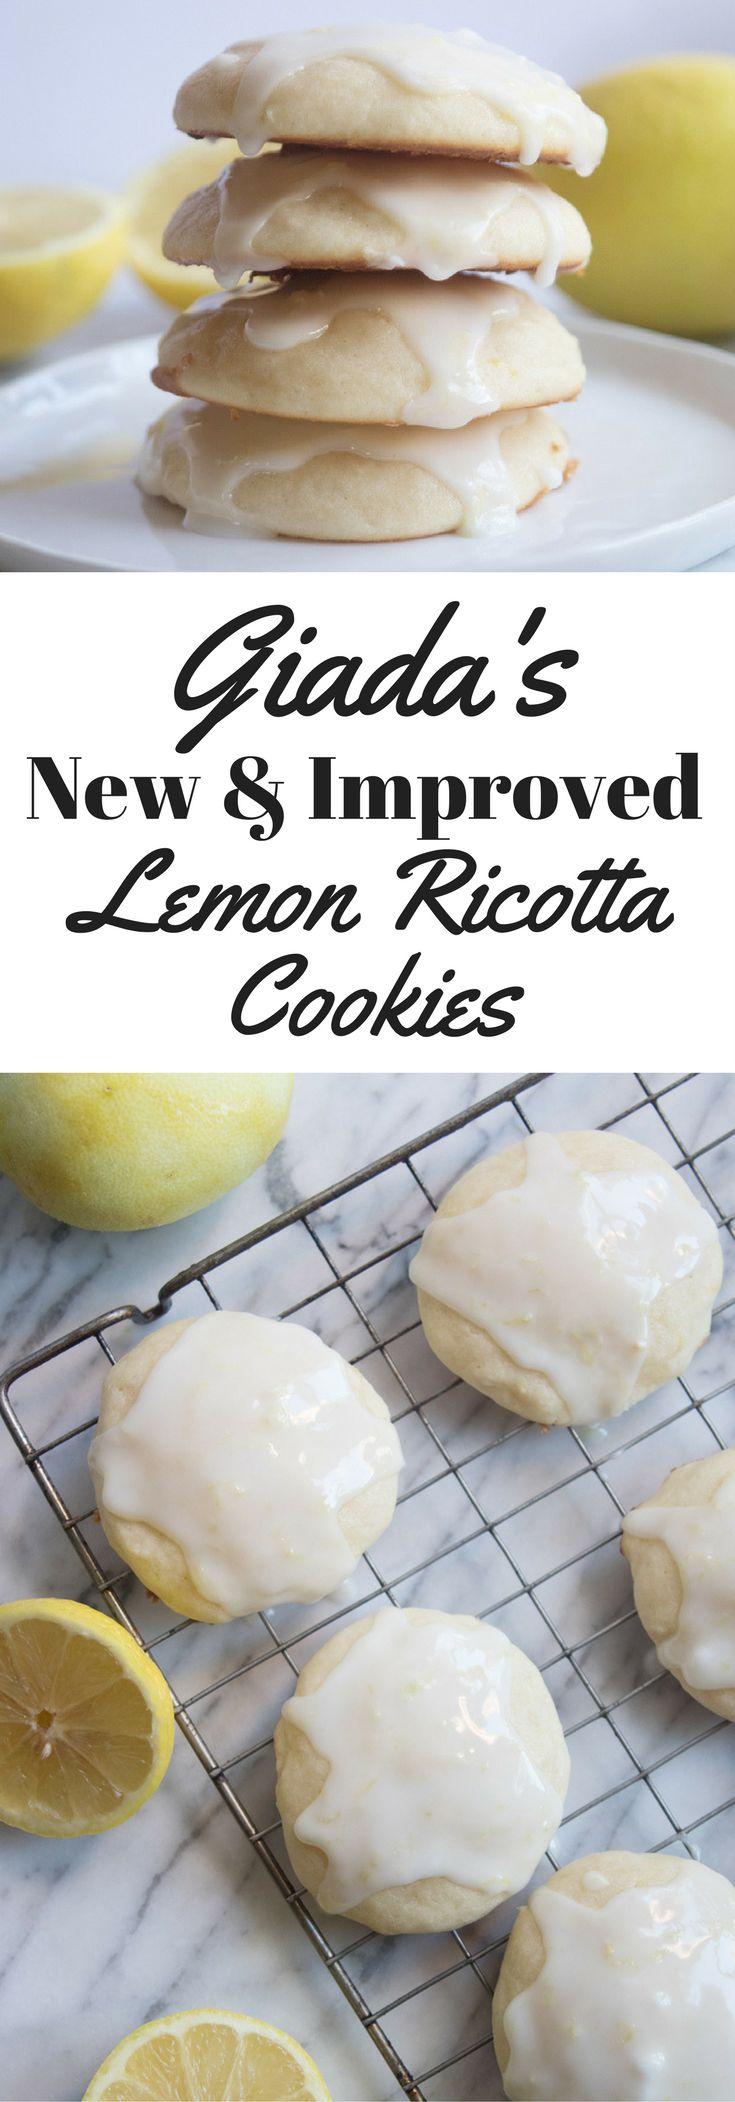 Giada De Laurentiis' famous, best-ever lemon ricotta cookies somehow got even better! - Giadzy